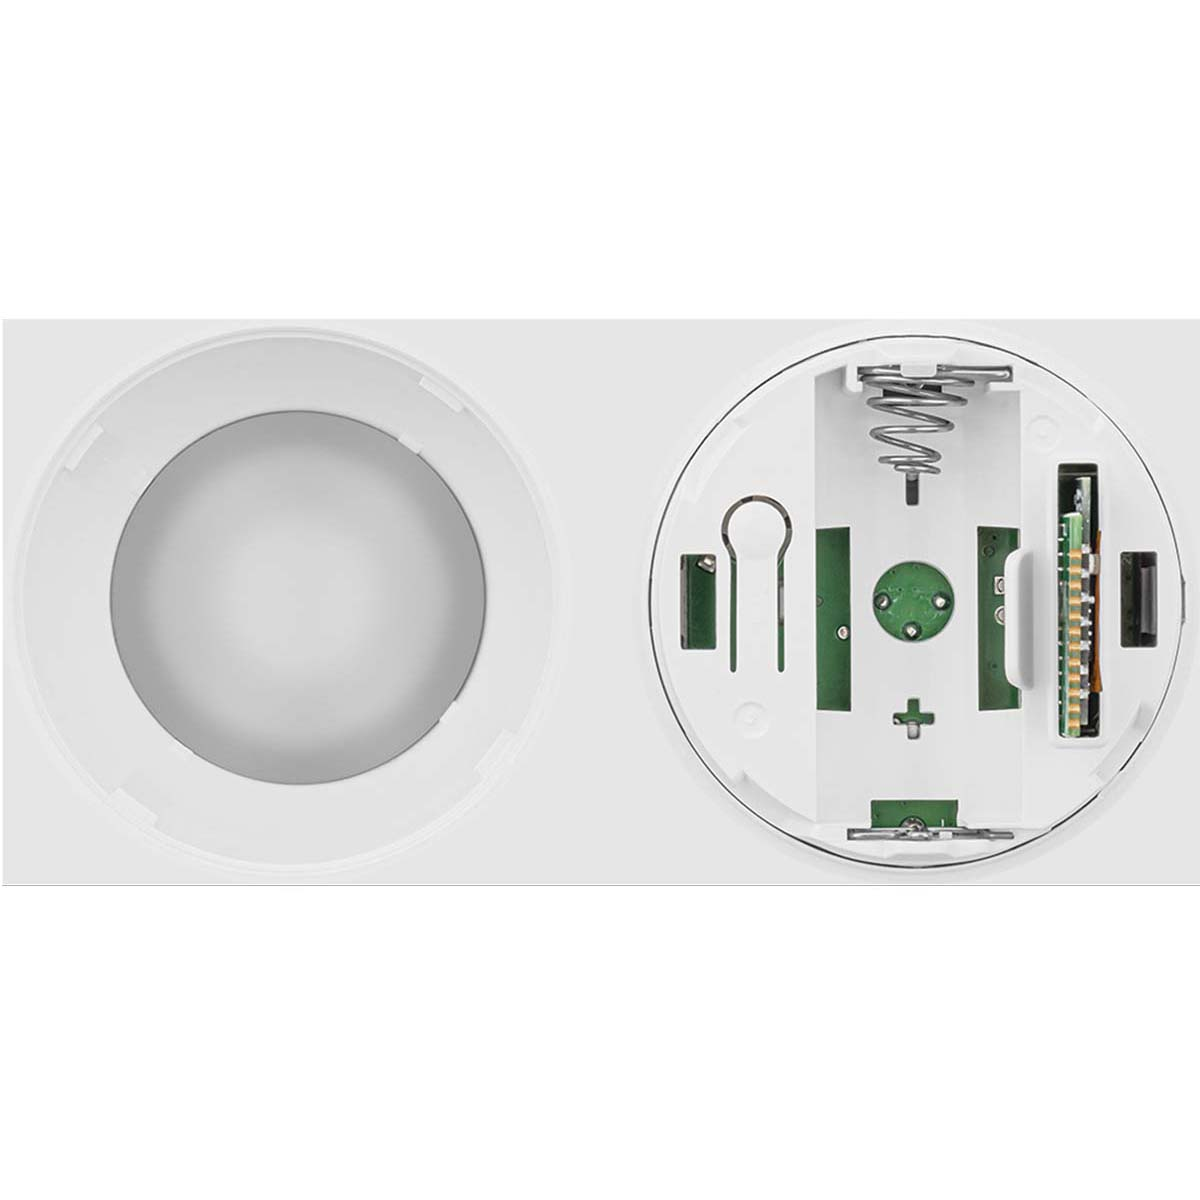 Kit 08 Sensor De Movimento Intelbras Smart Ism 1001